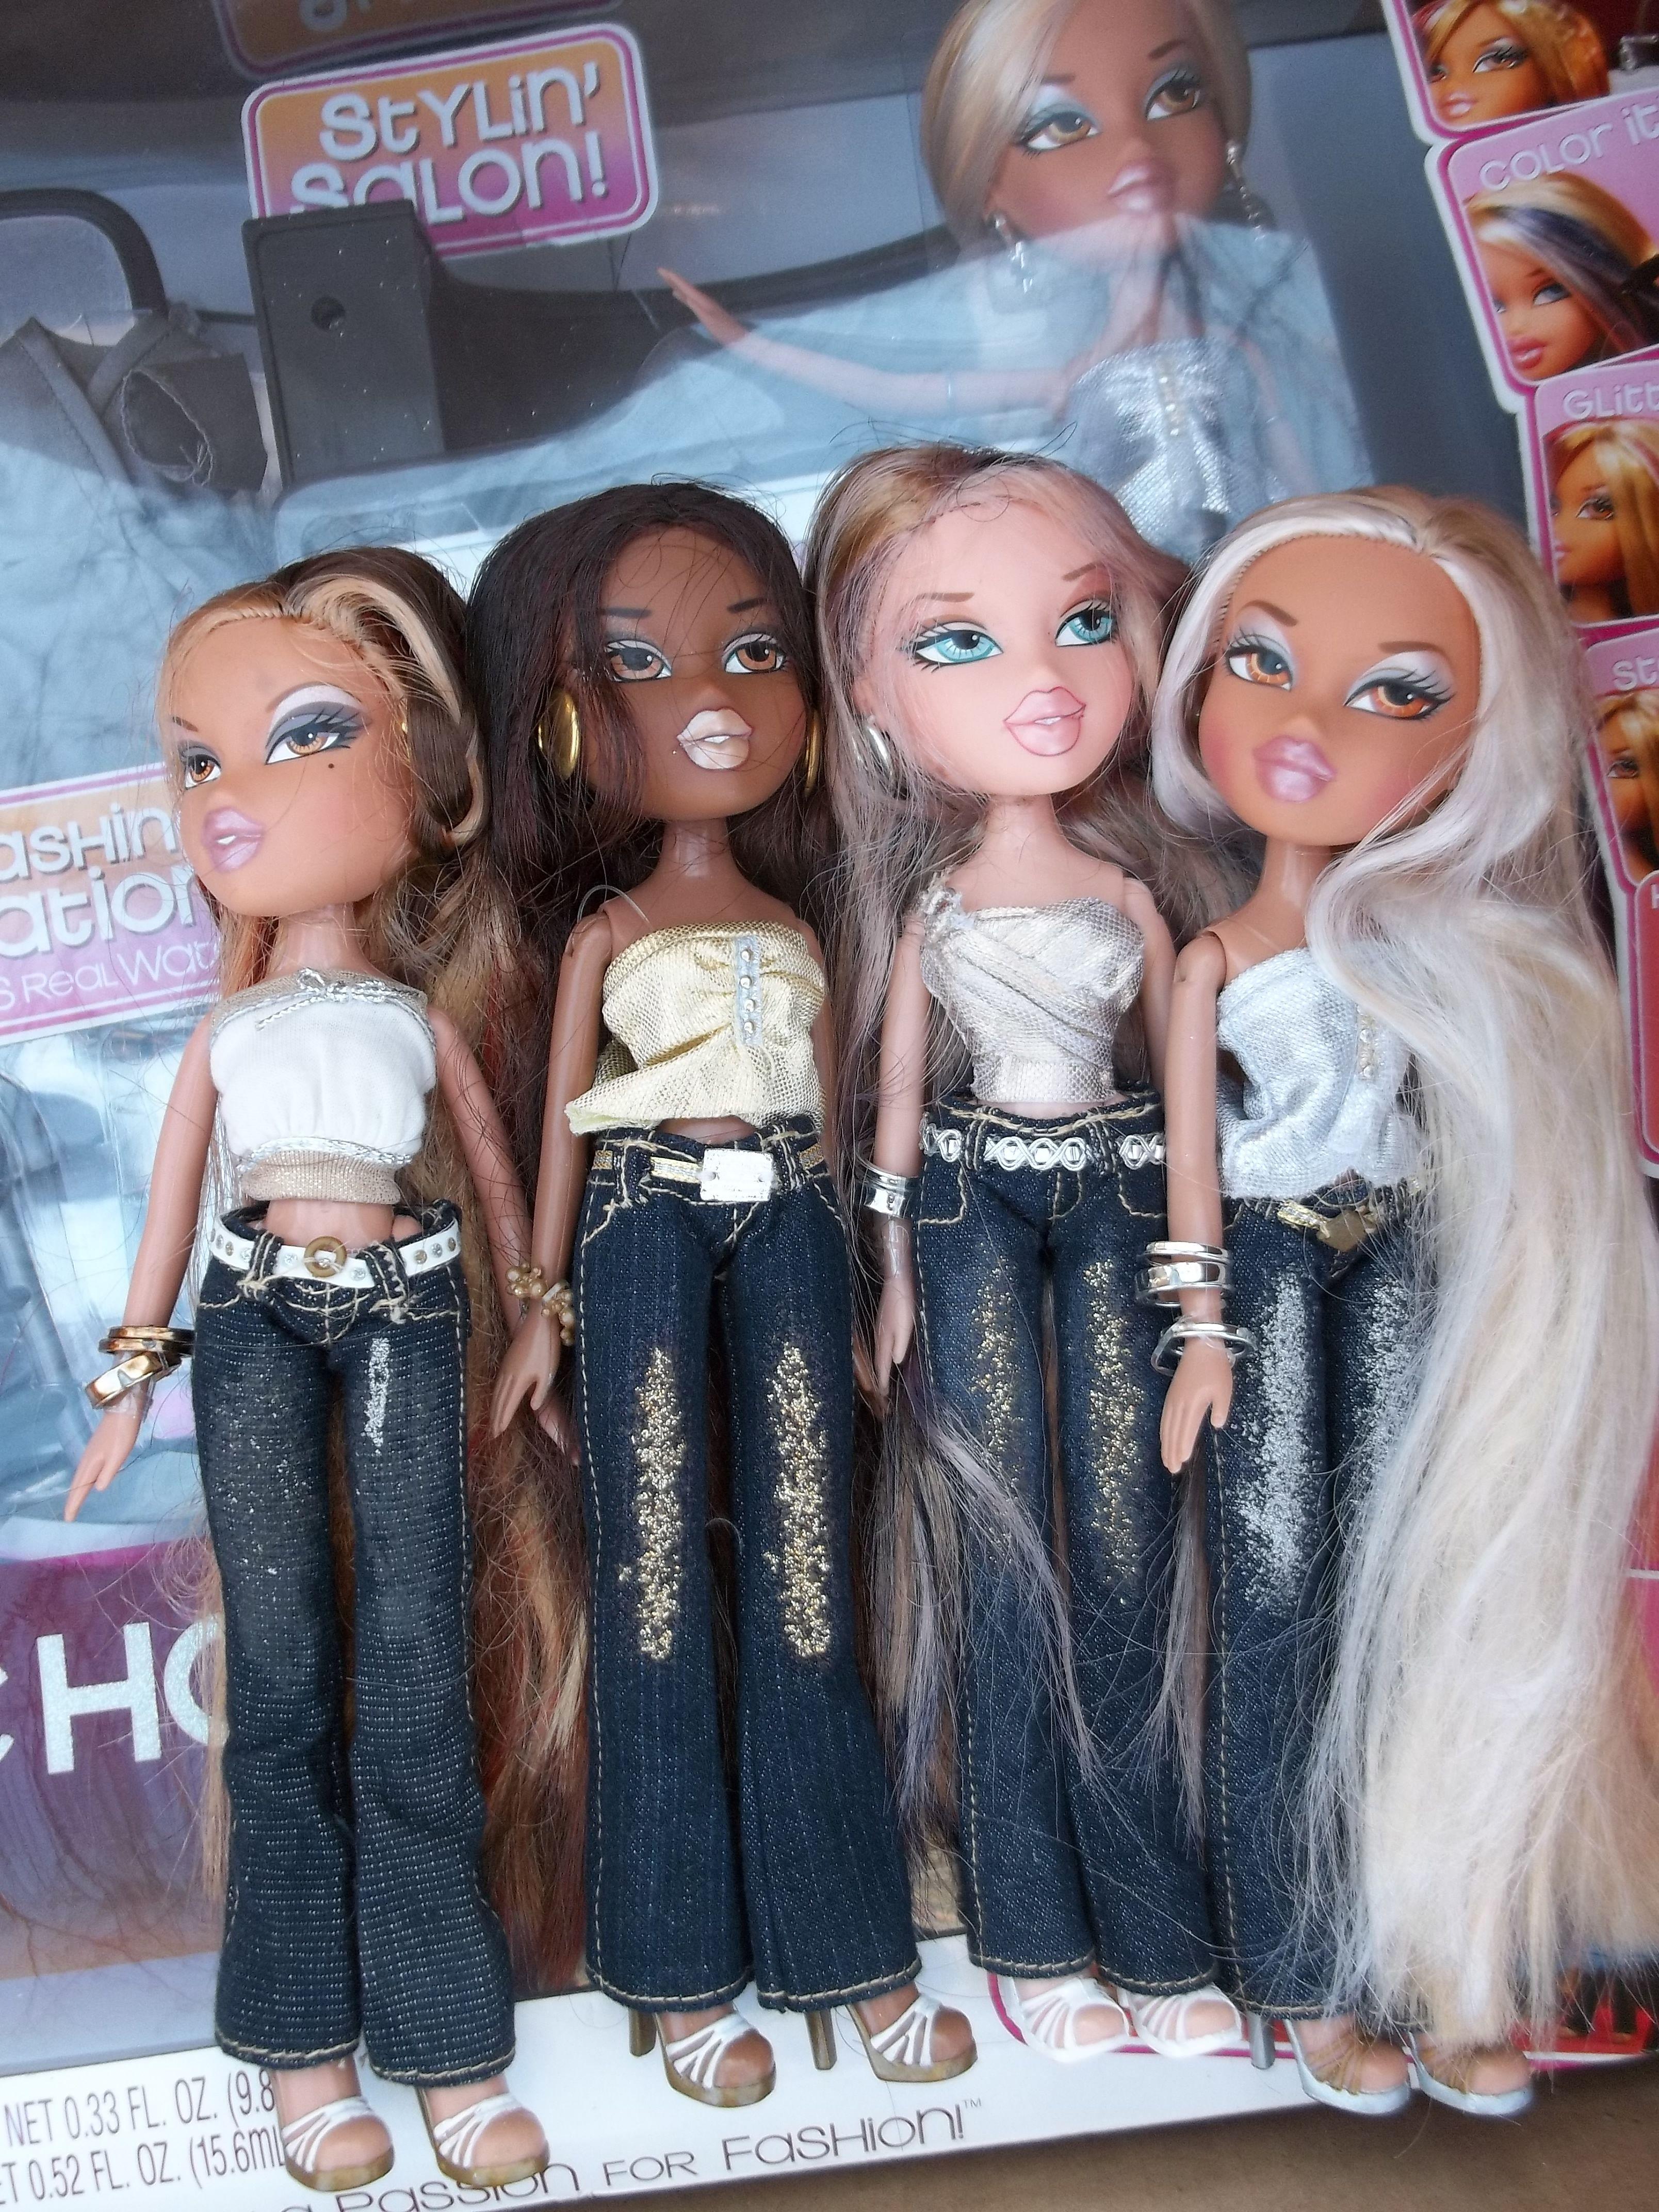 Bratz Magic Hair Salon - Mary.com - Girl games and gossip